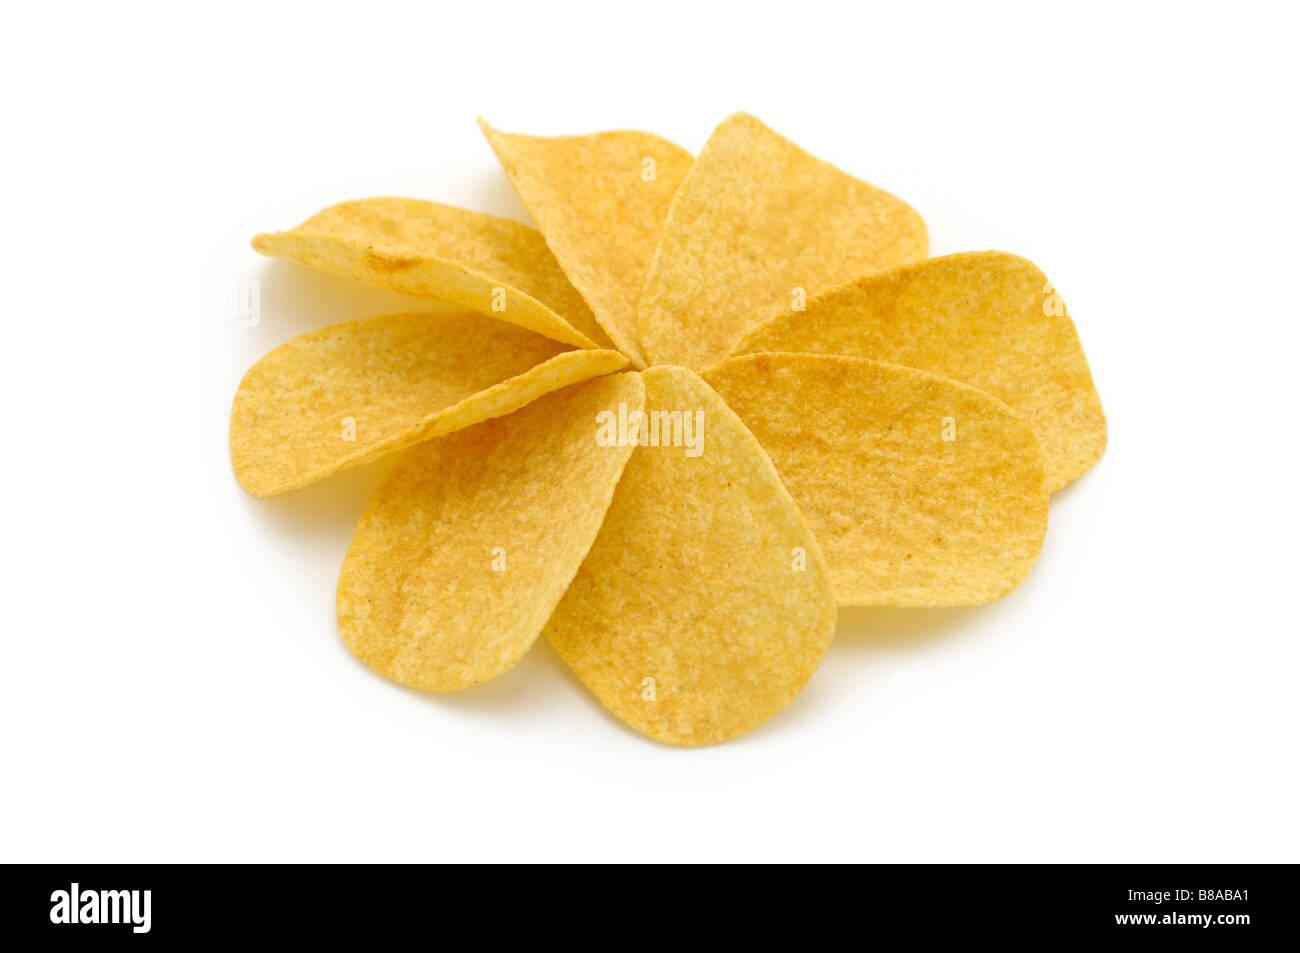 Flavoured Potato Crisps/Chips - Stock Image